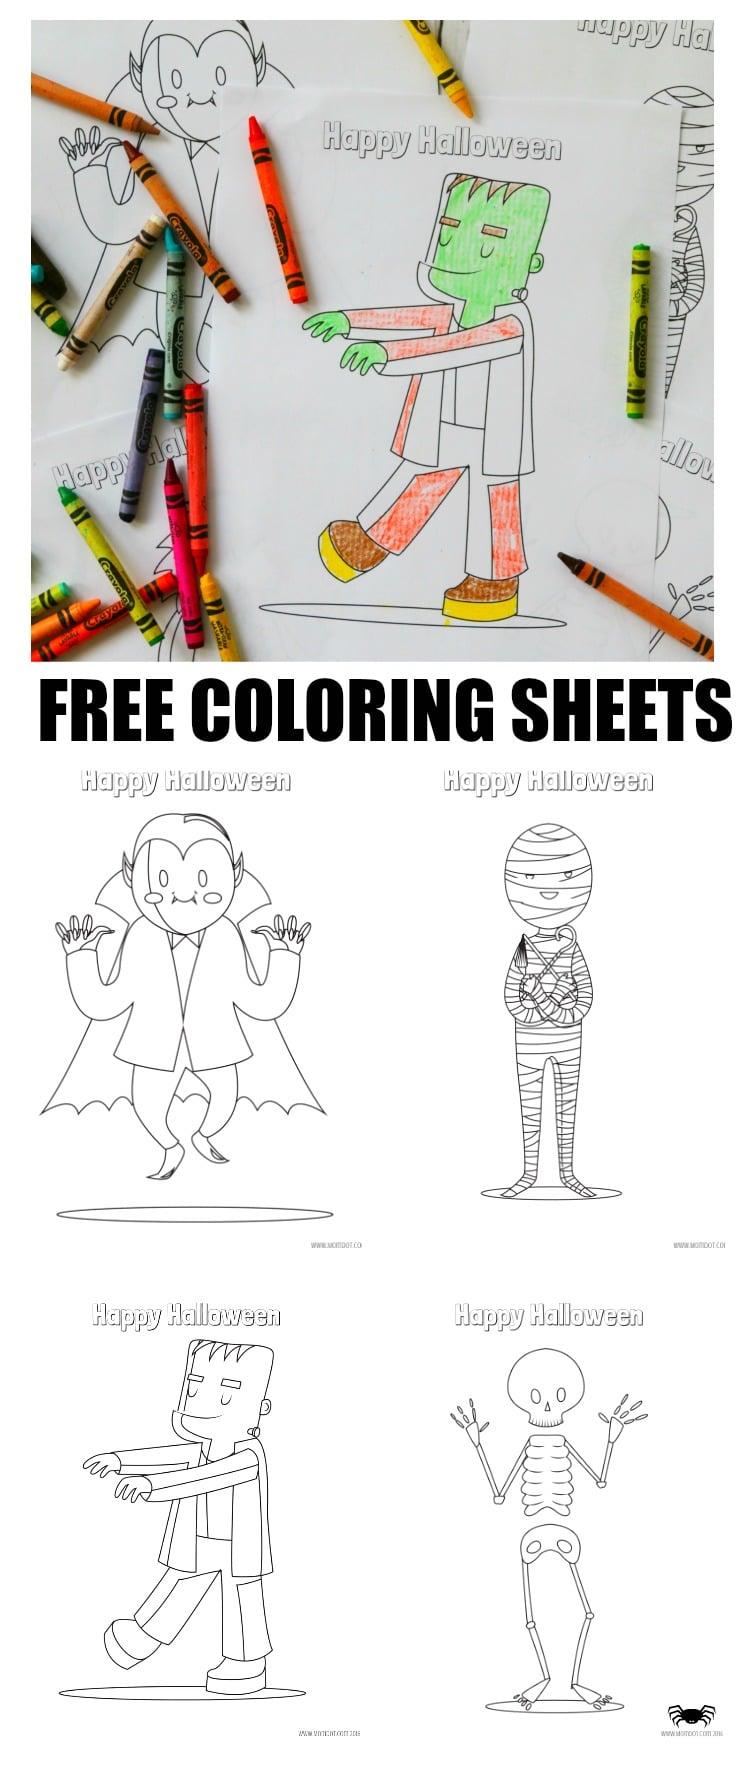 coloringsheets